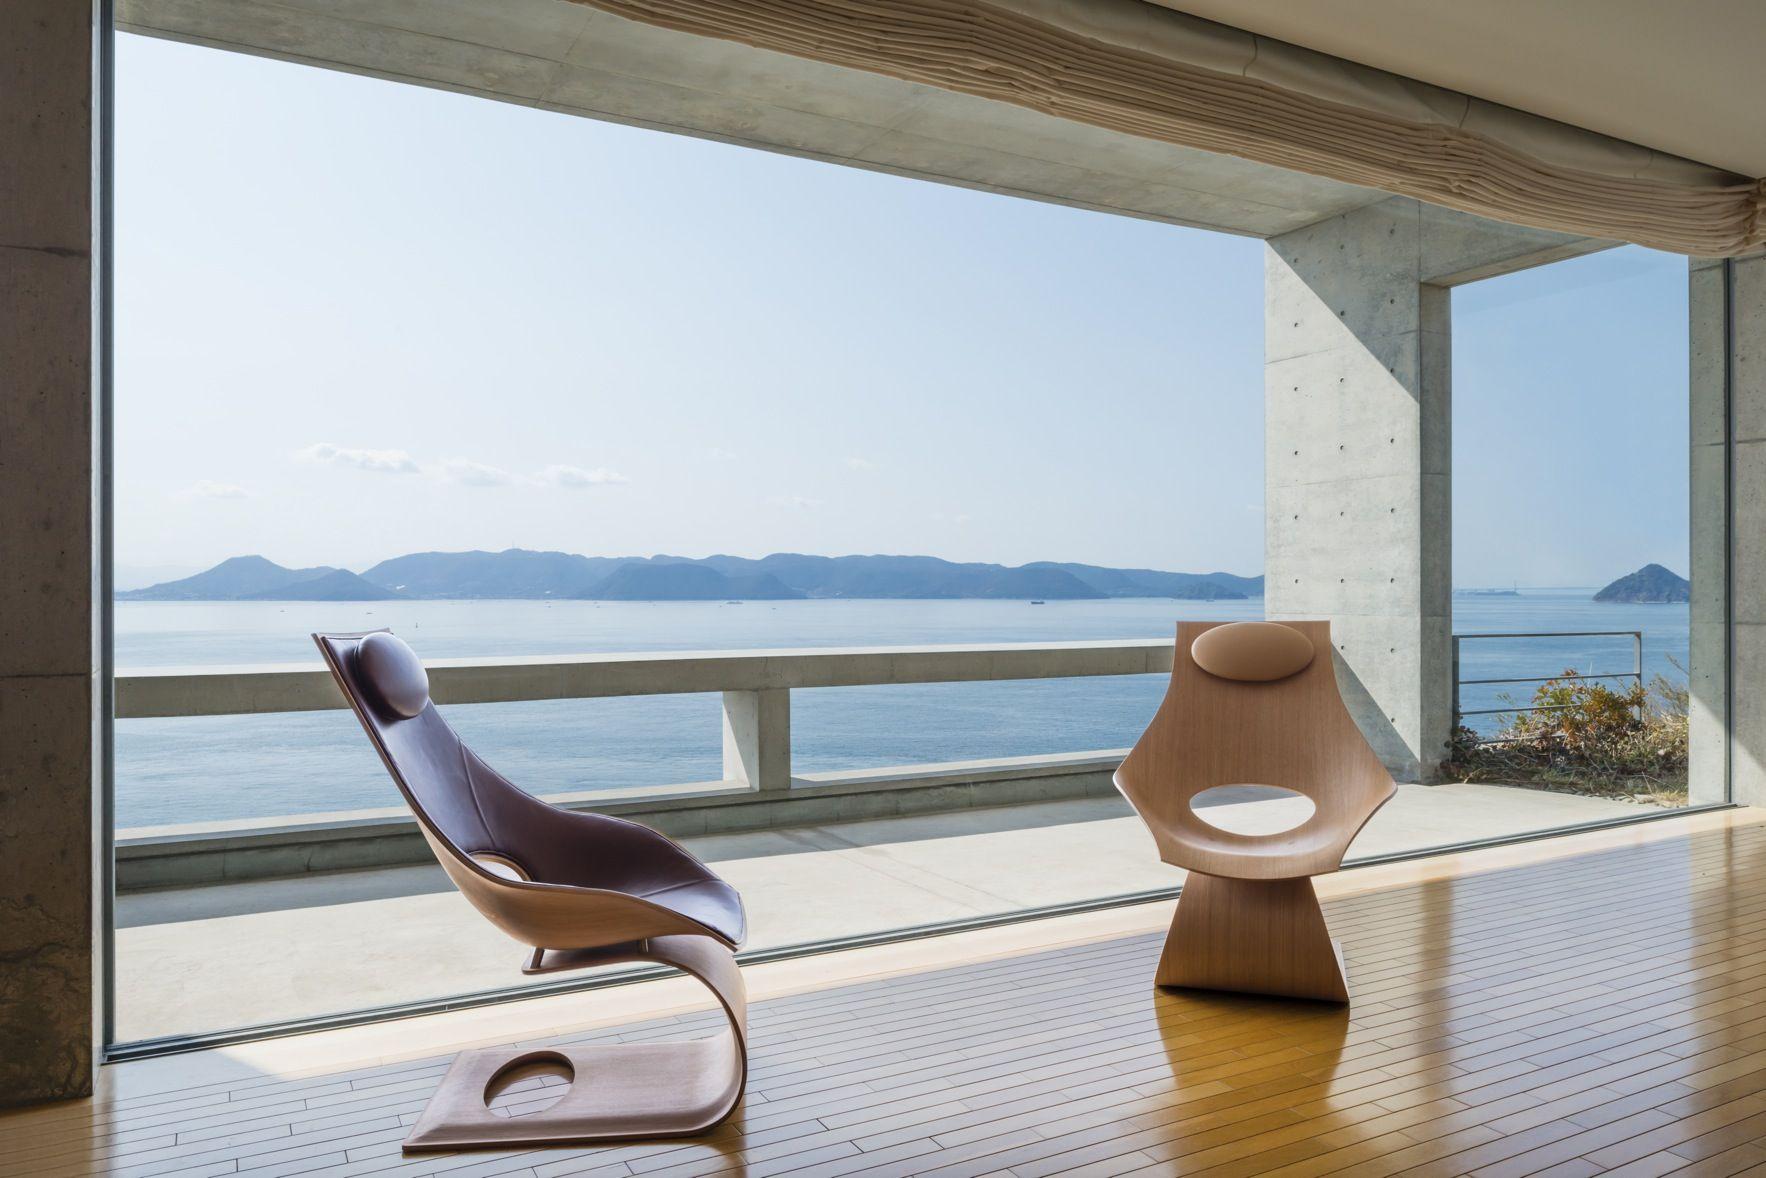 TA001 DREAM CHAIR Designed by Tadao Ando for Carl Hansen